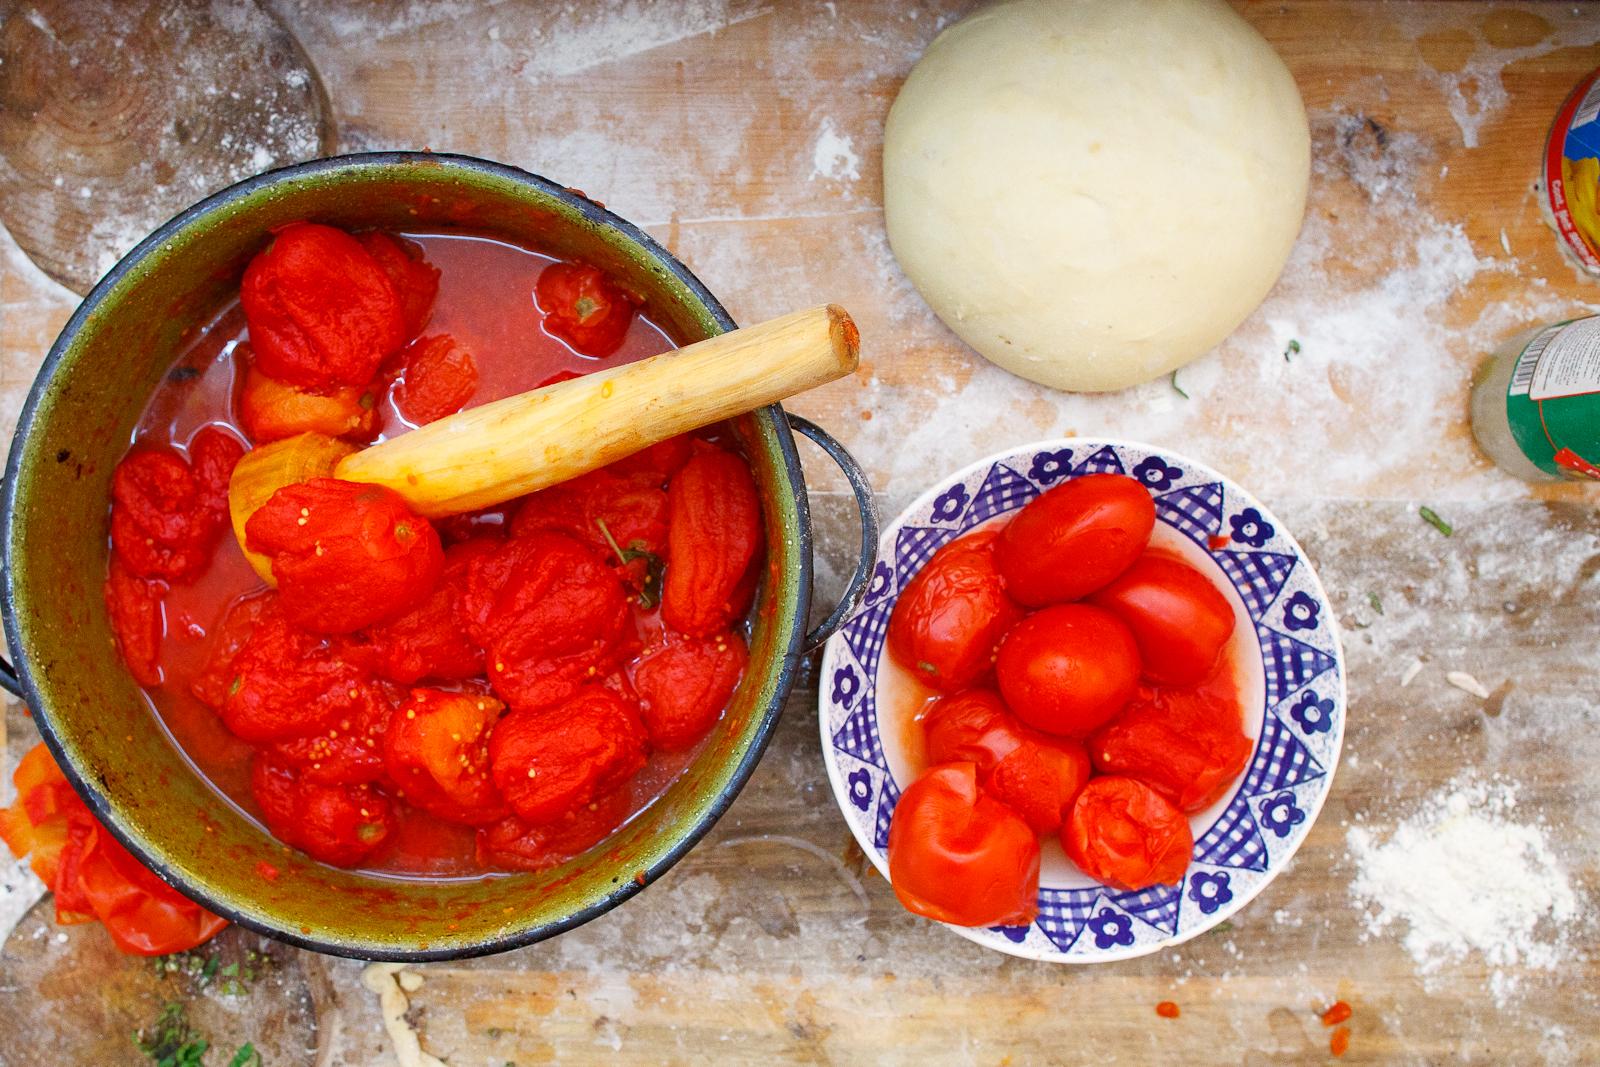 Crushing fresh tomatoes for sauce